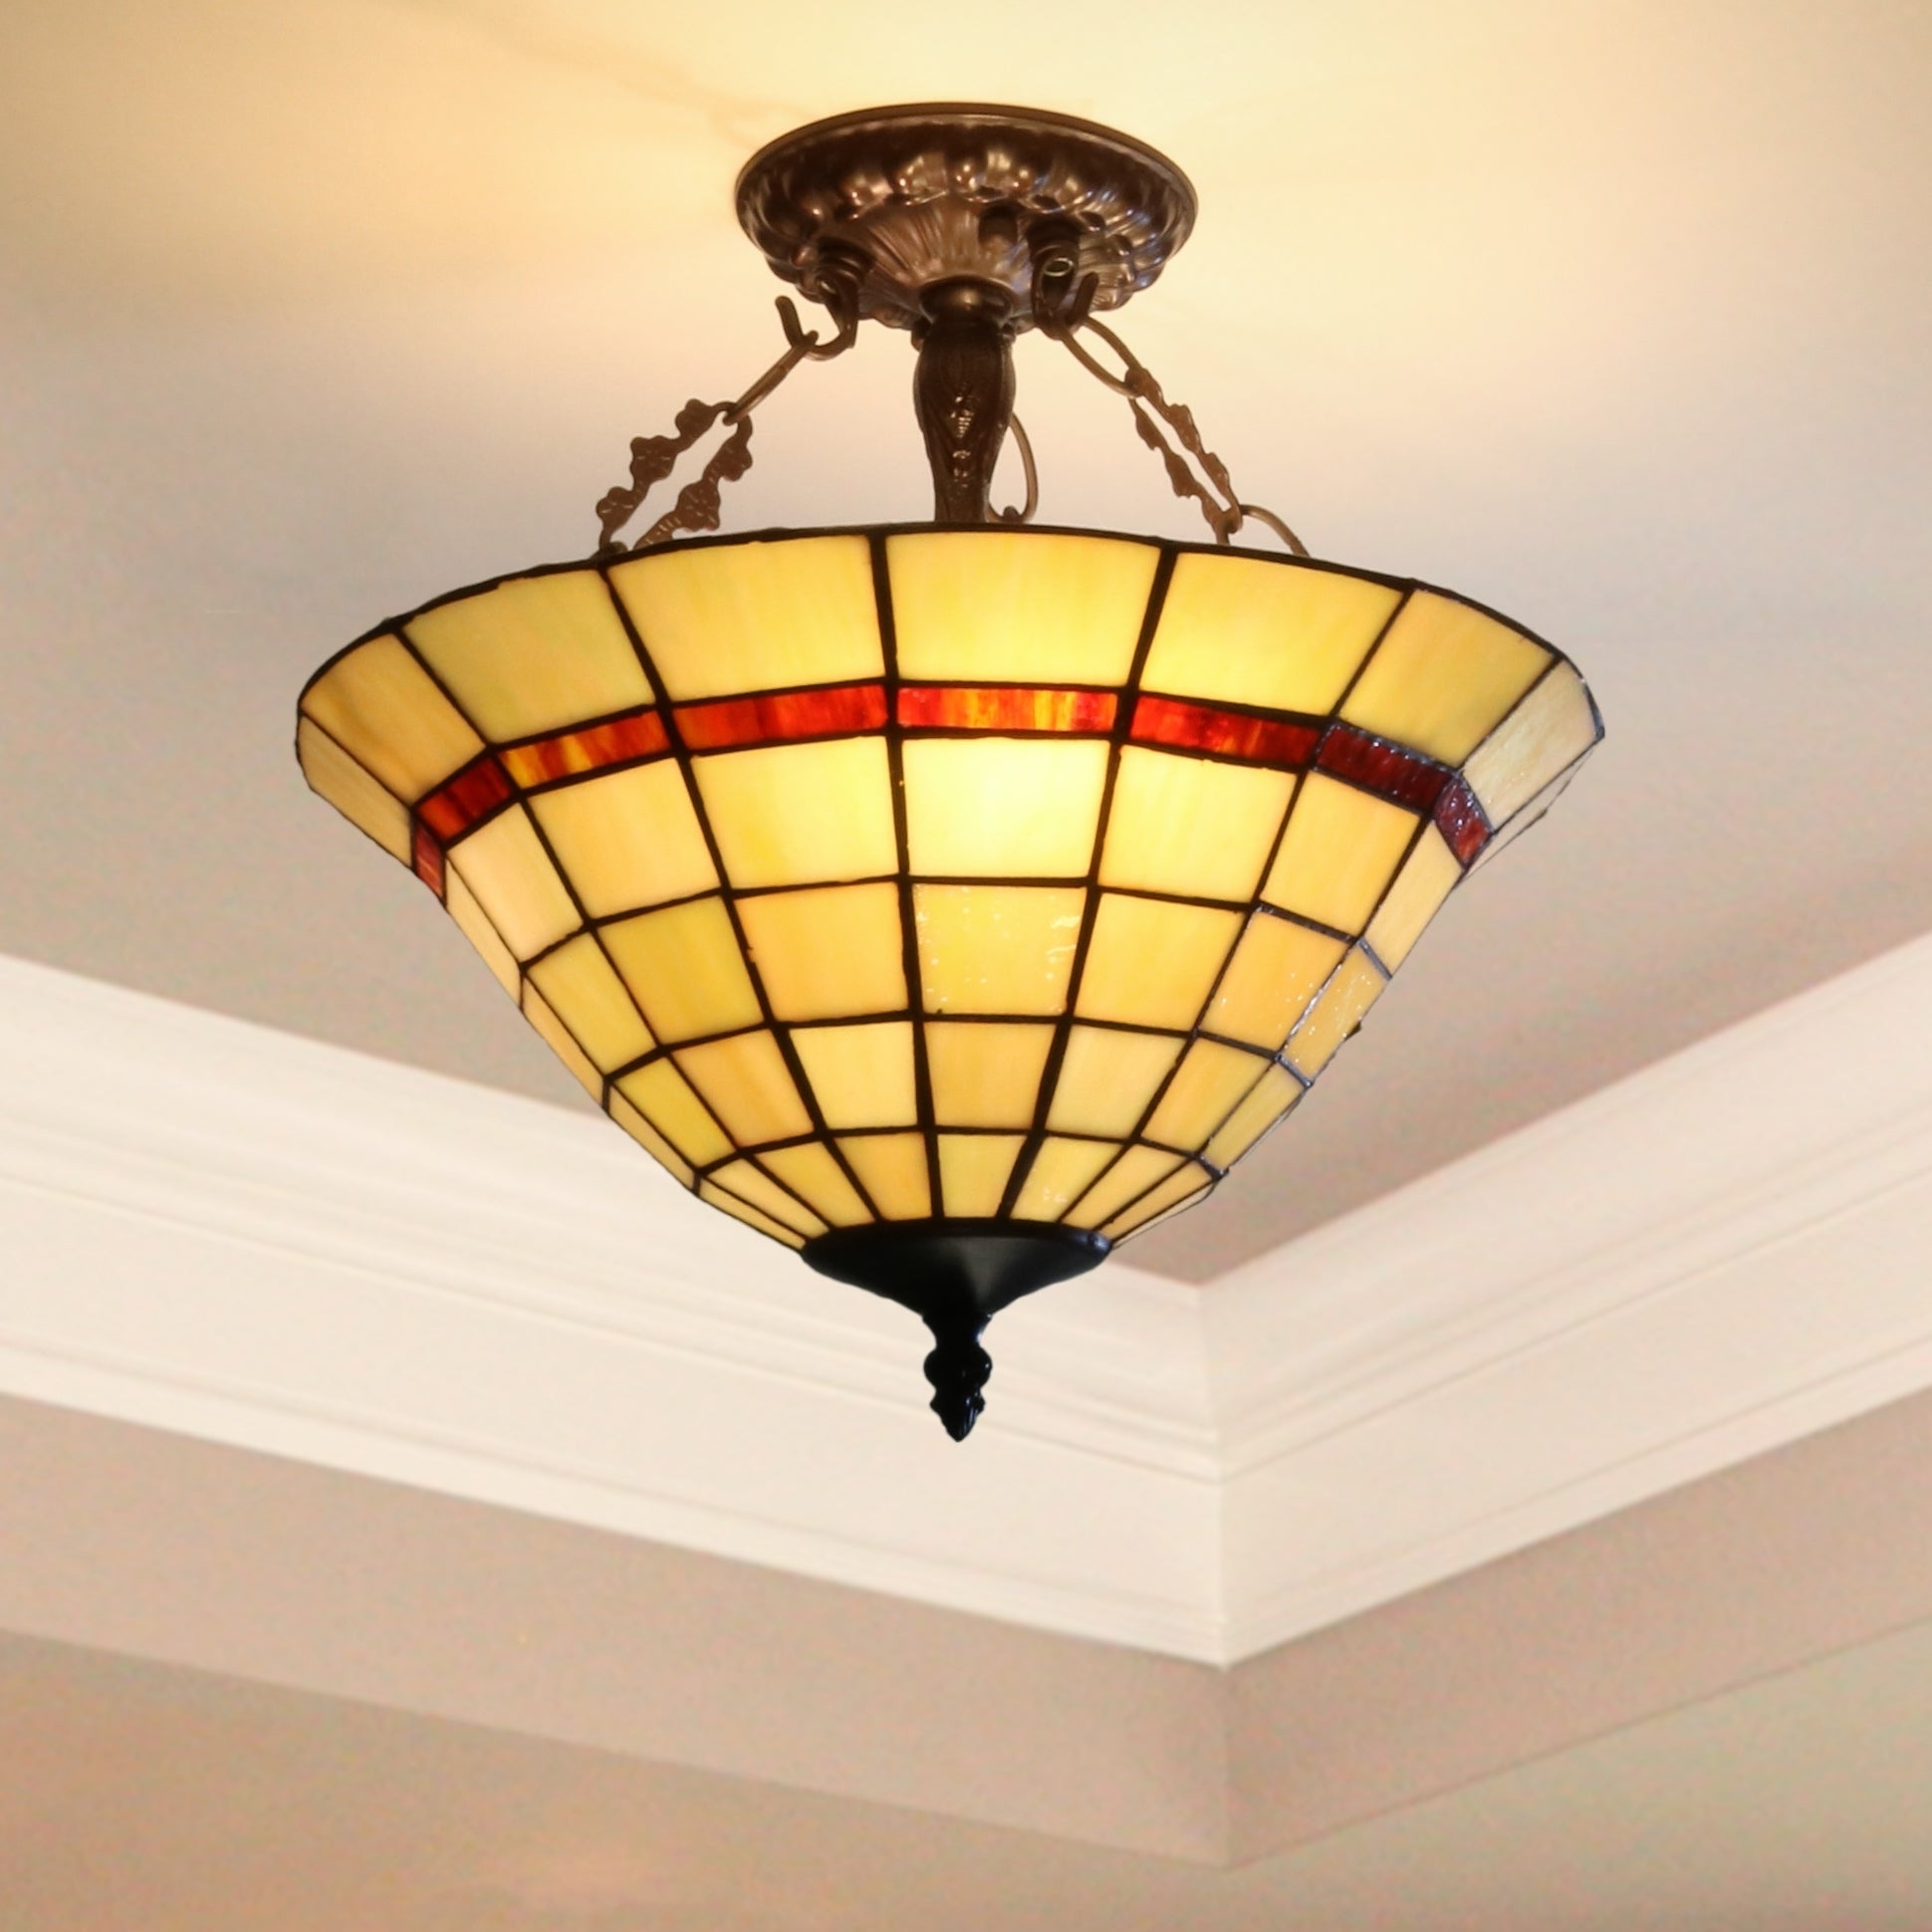 Tiffany Style Semi Flush Mount Ceiling